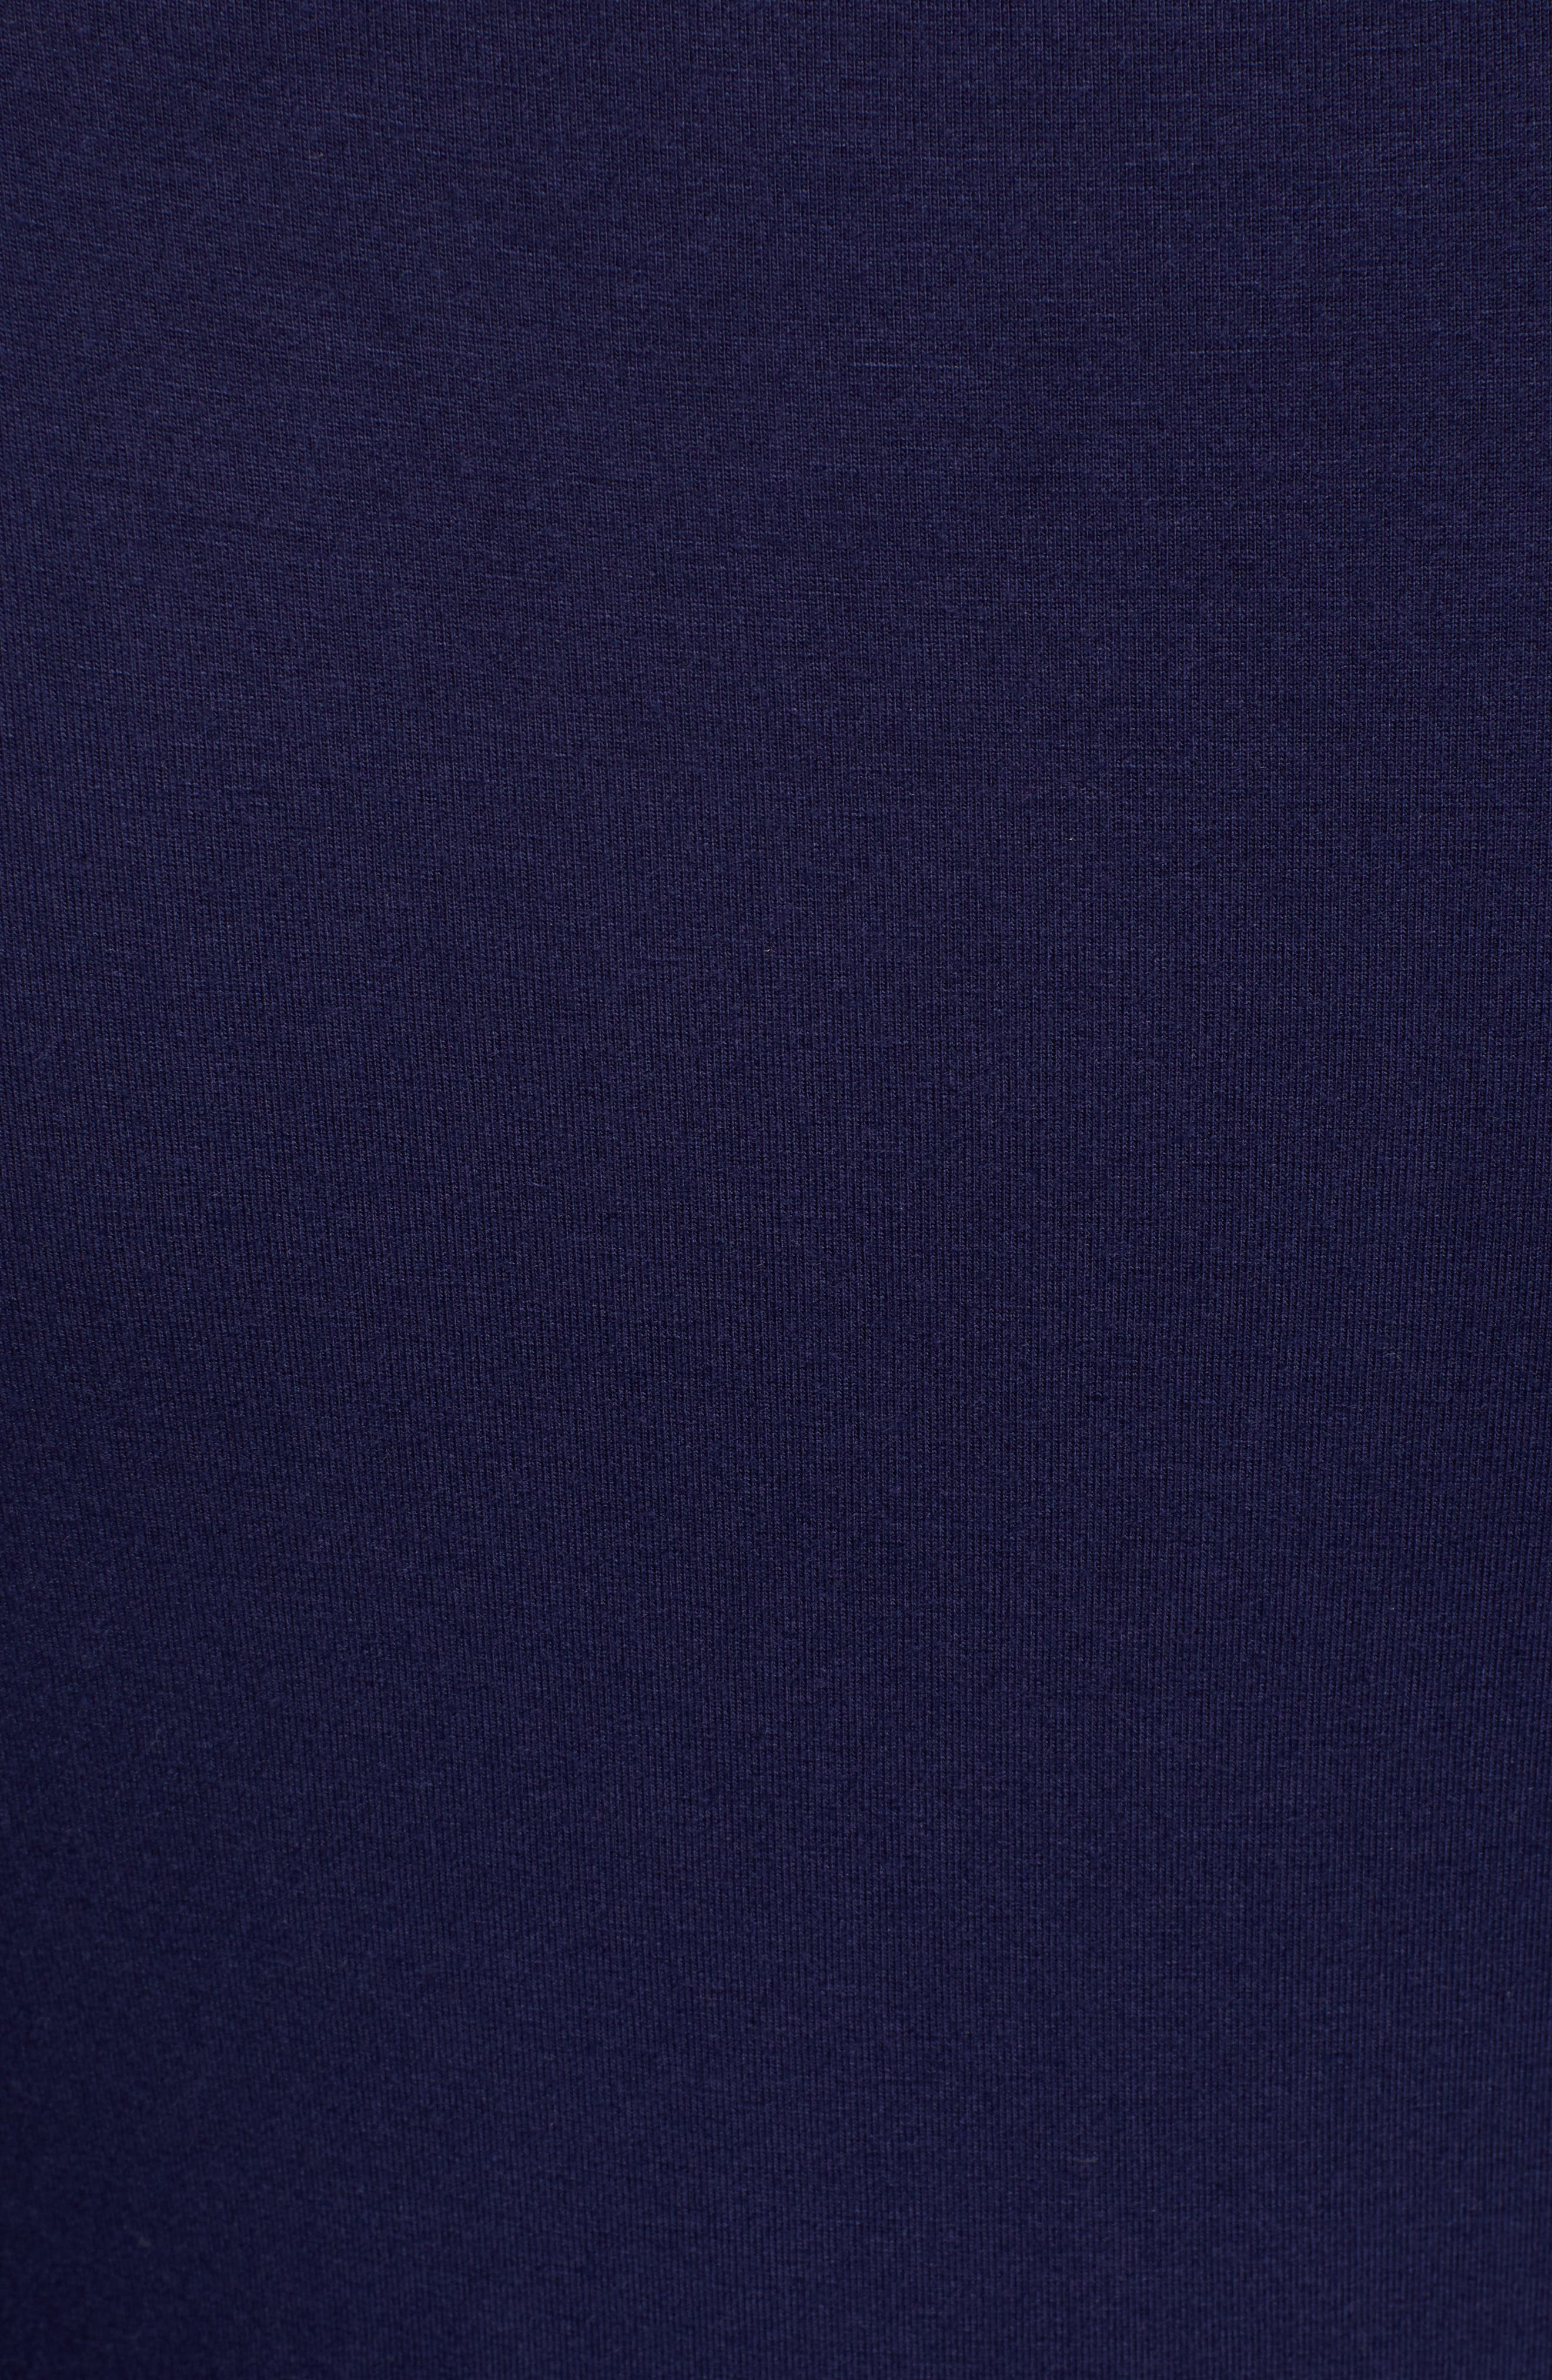 Side Ruched Turtleneck Dress,                             Alternate thumbnail 6, color,                             NAVY PEACOAT